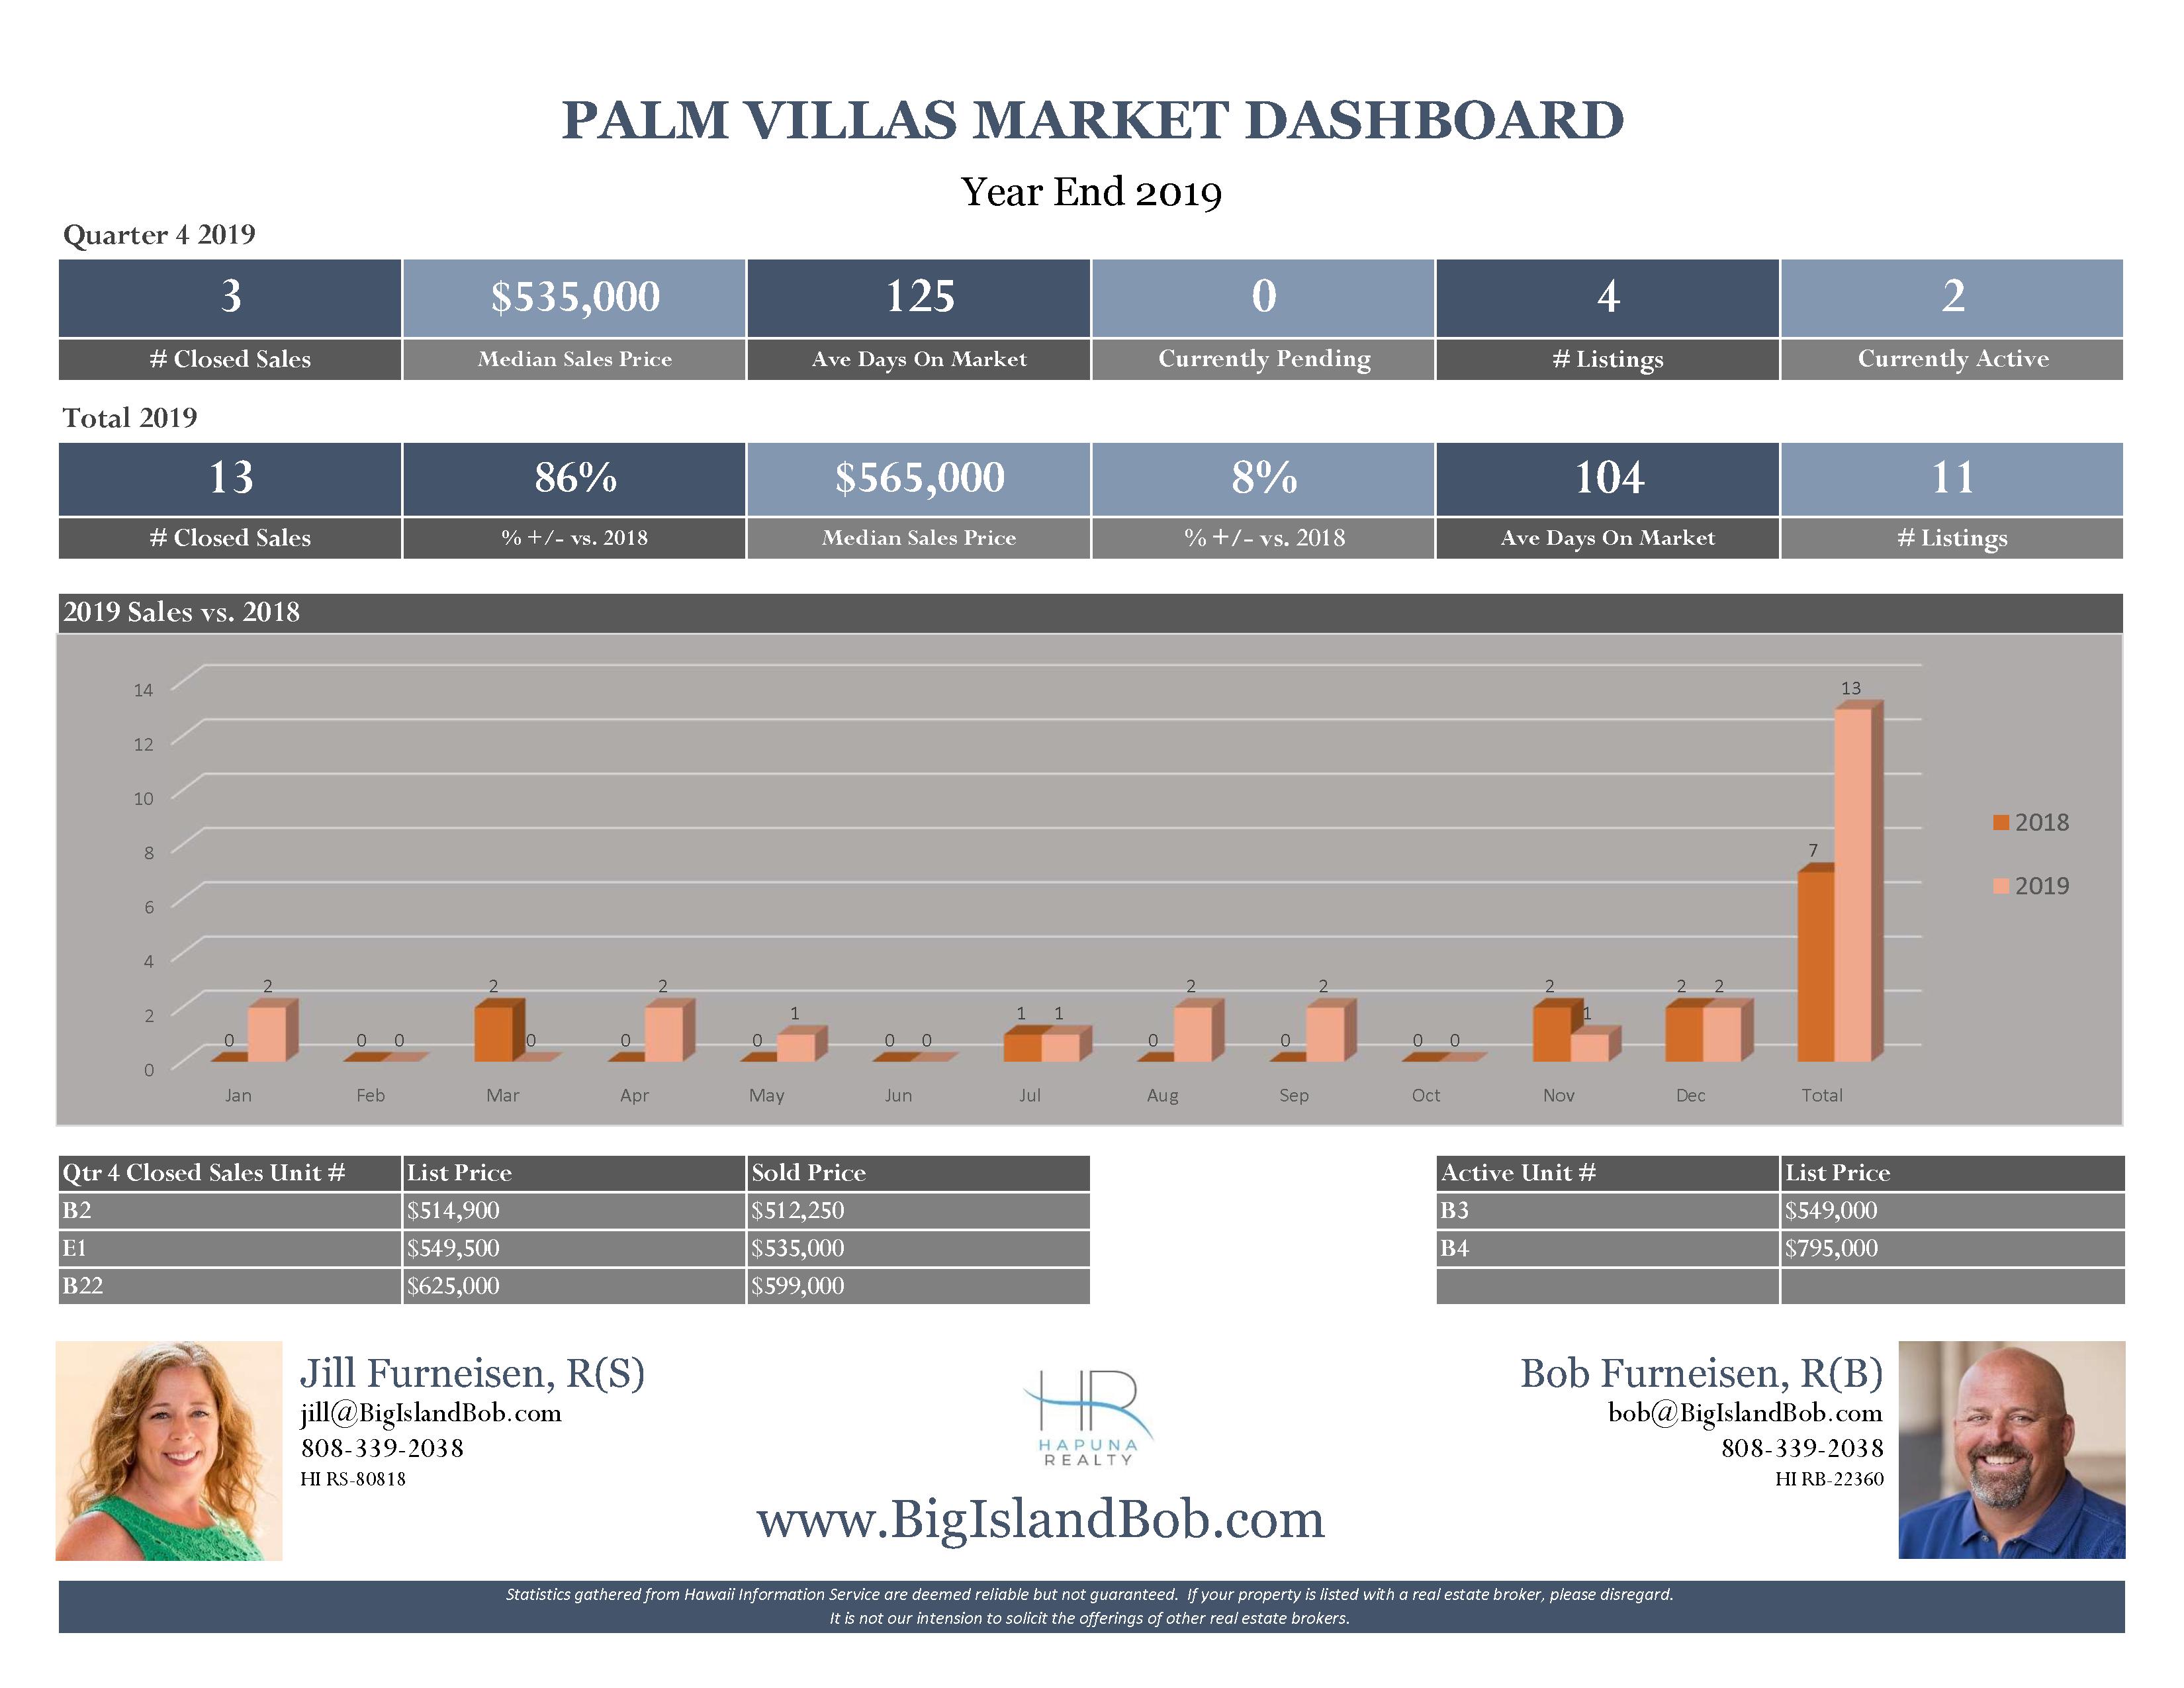 Palm Villas at Mauna Lani Year End 2019 Real Estate Market Dashboard